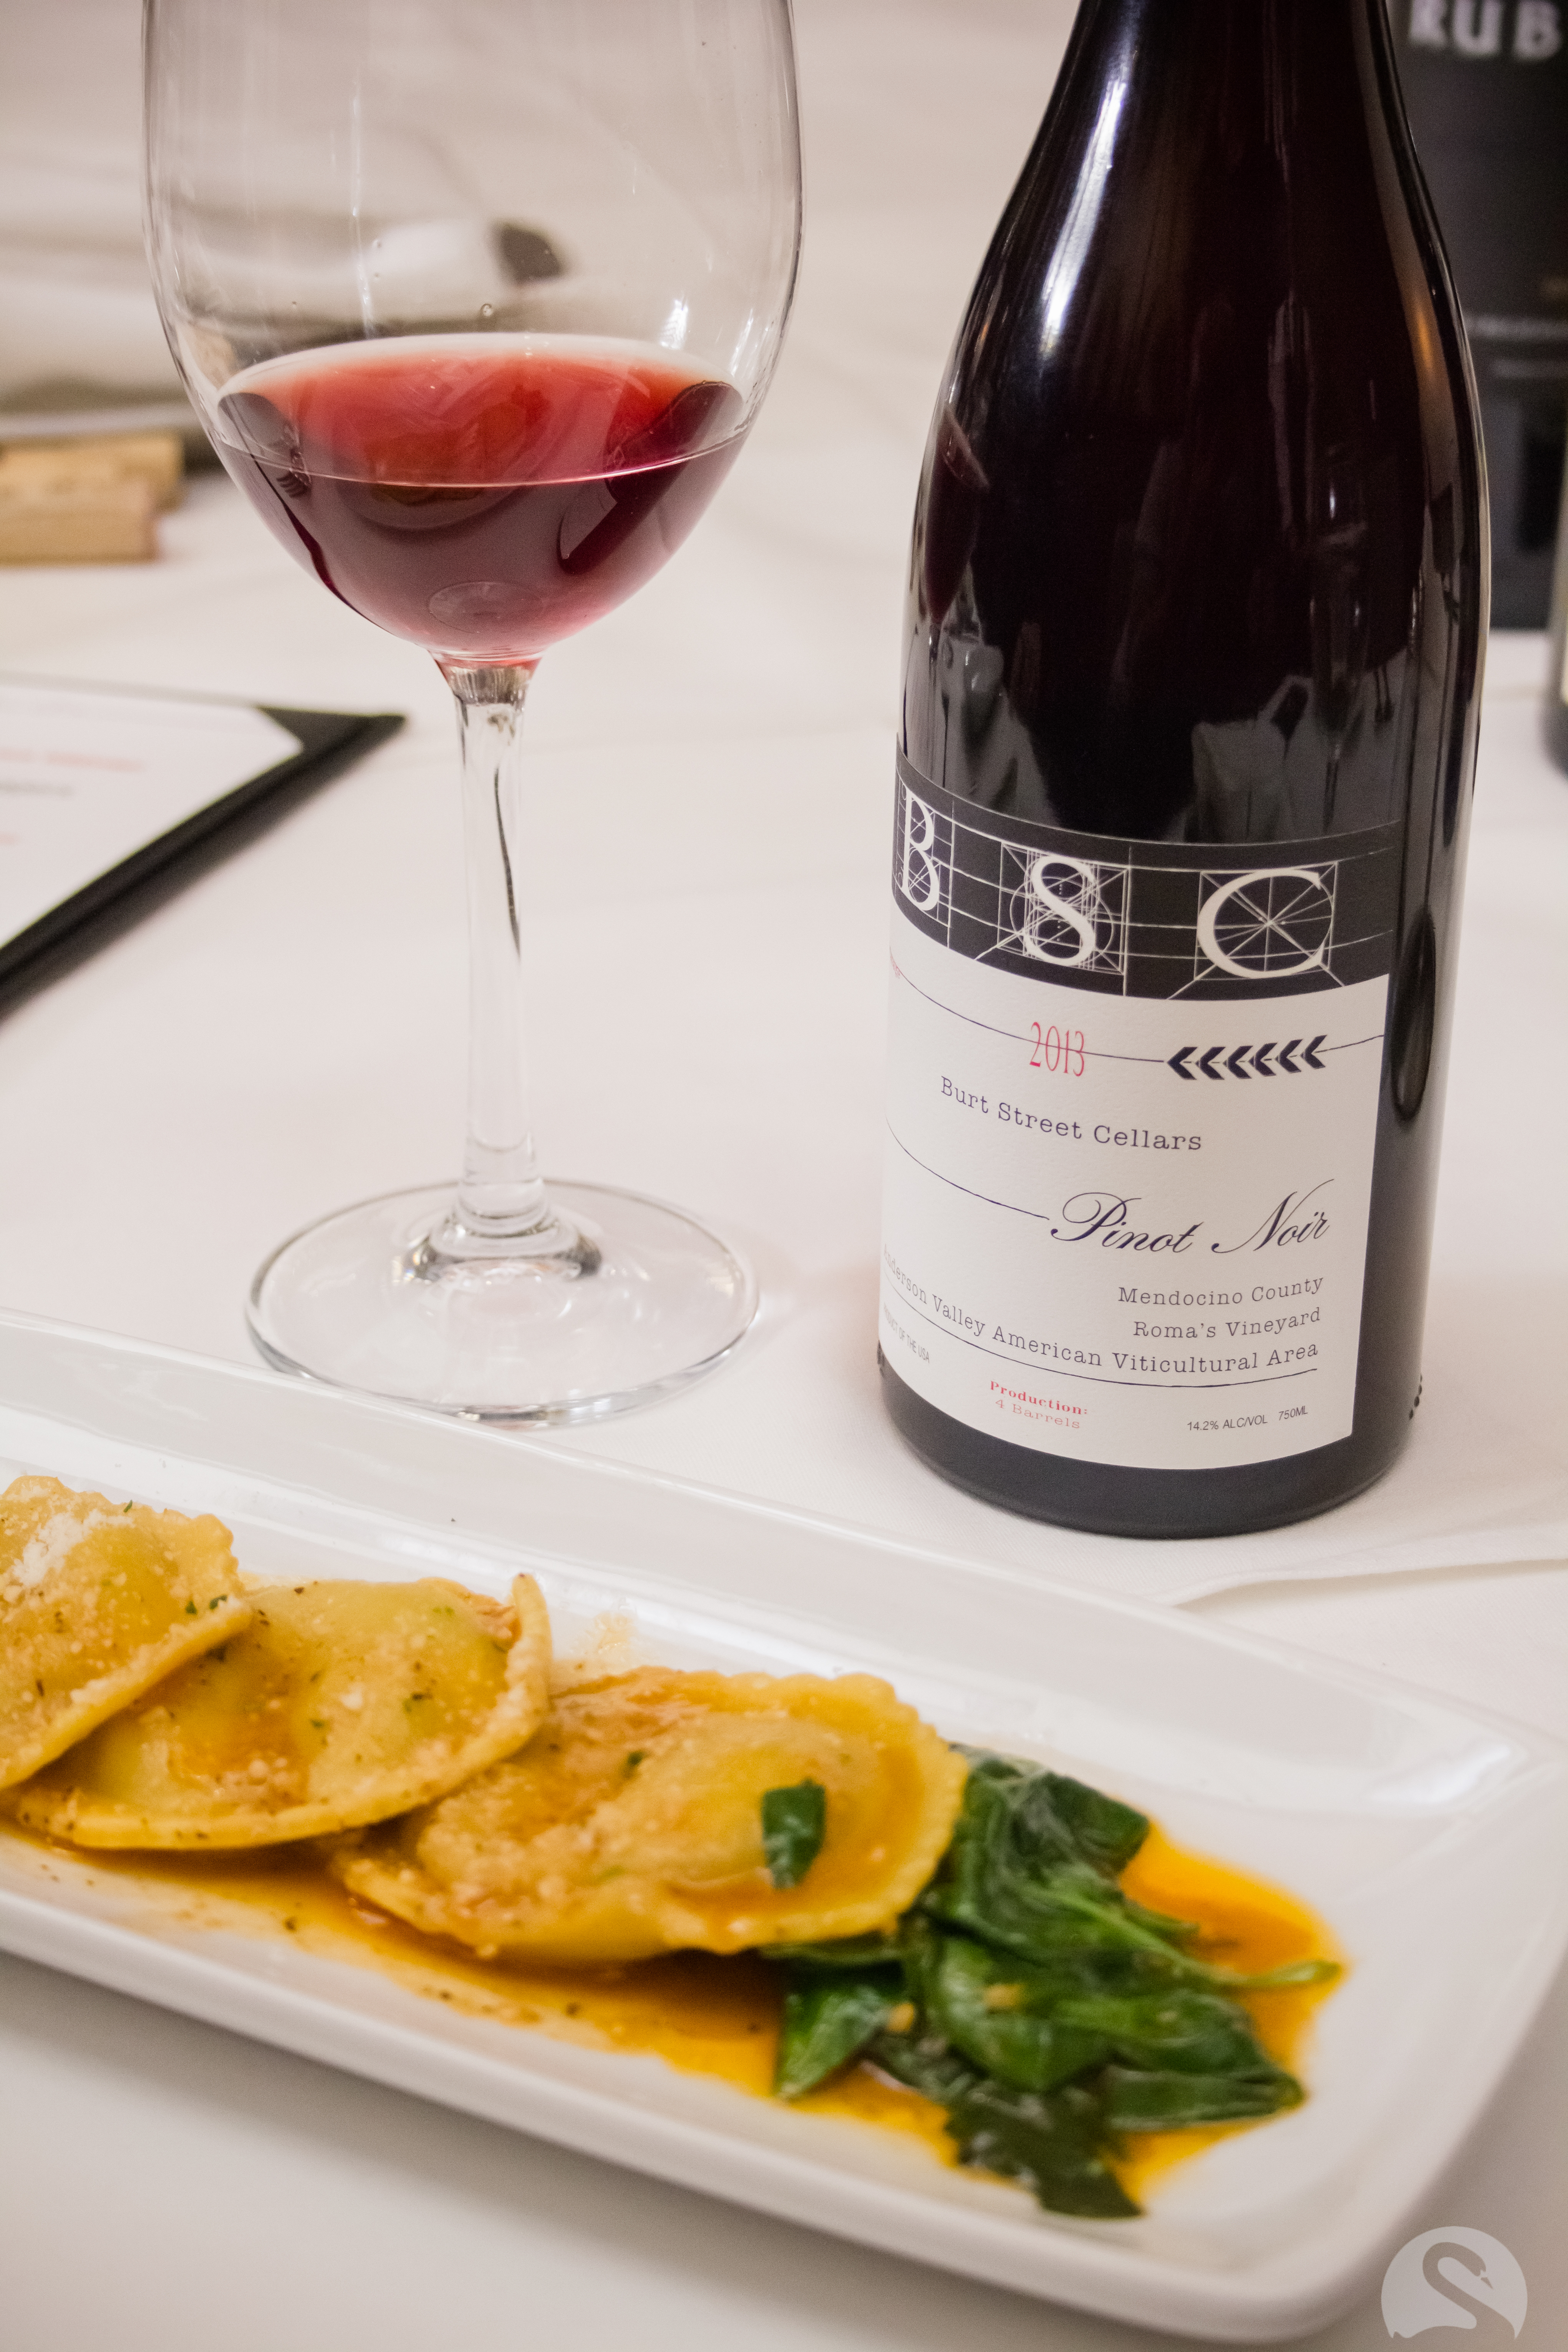 Bert Street Pinot served with Ravioli